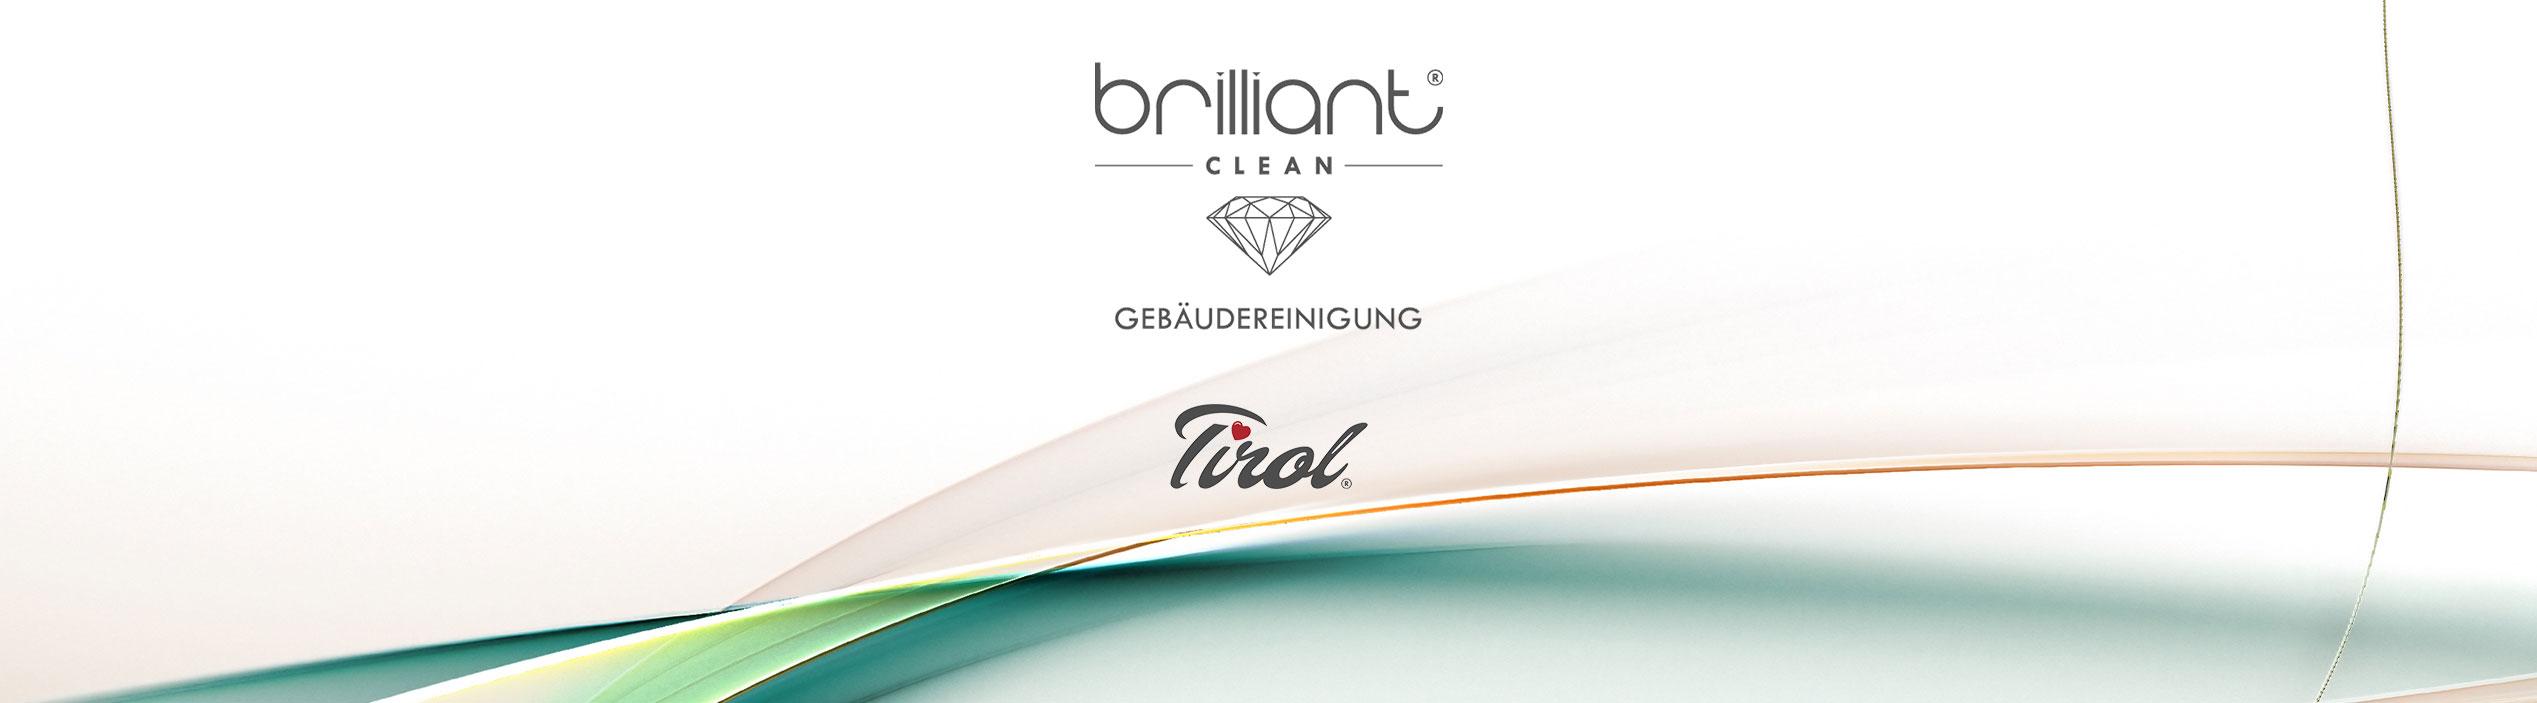 gebaeudreinigung-innsbruck-brilliant-clean-reinigungsfirma-innsbruck-tirol